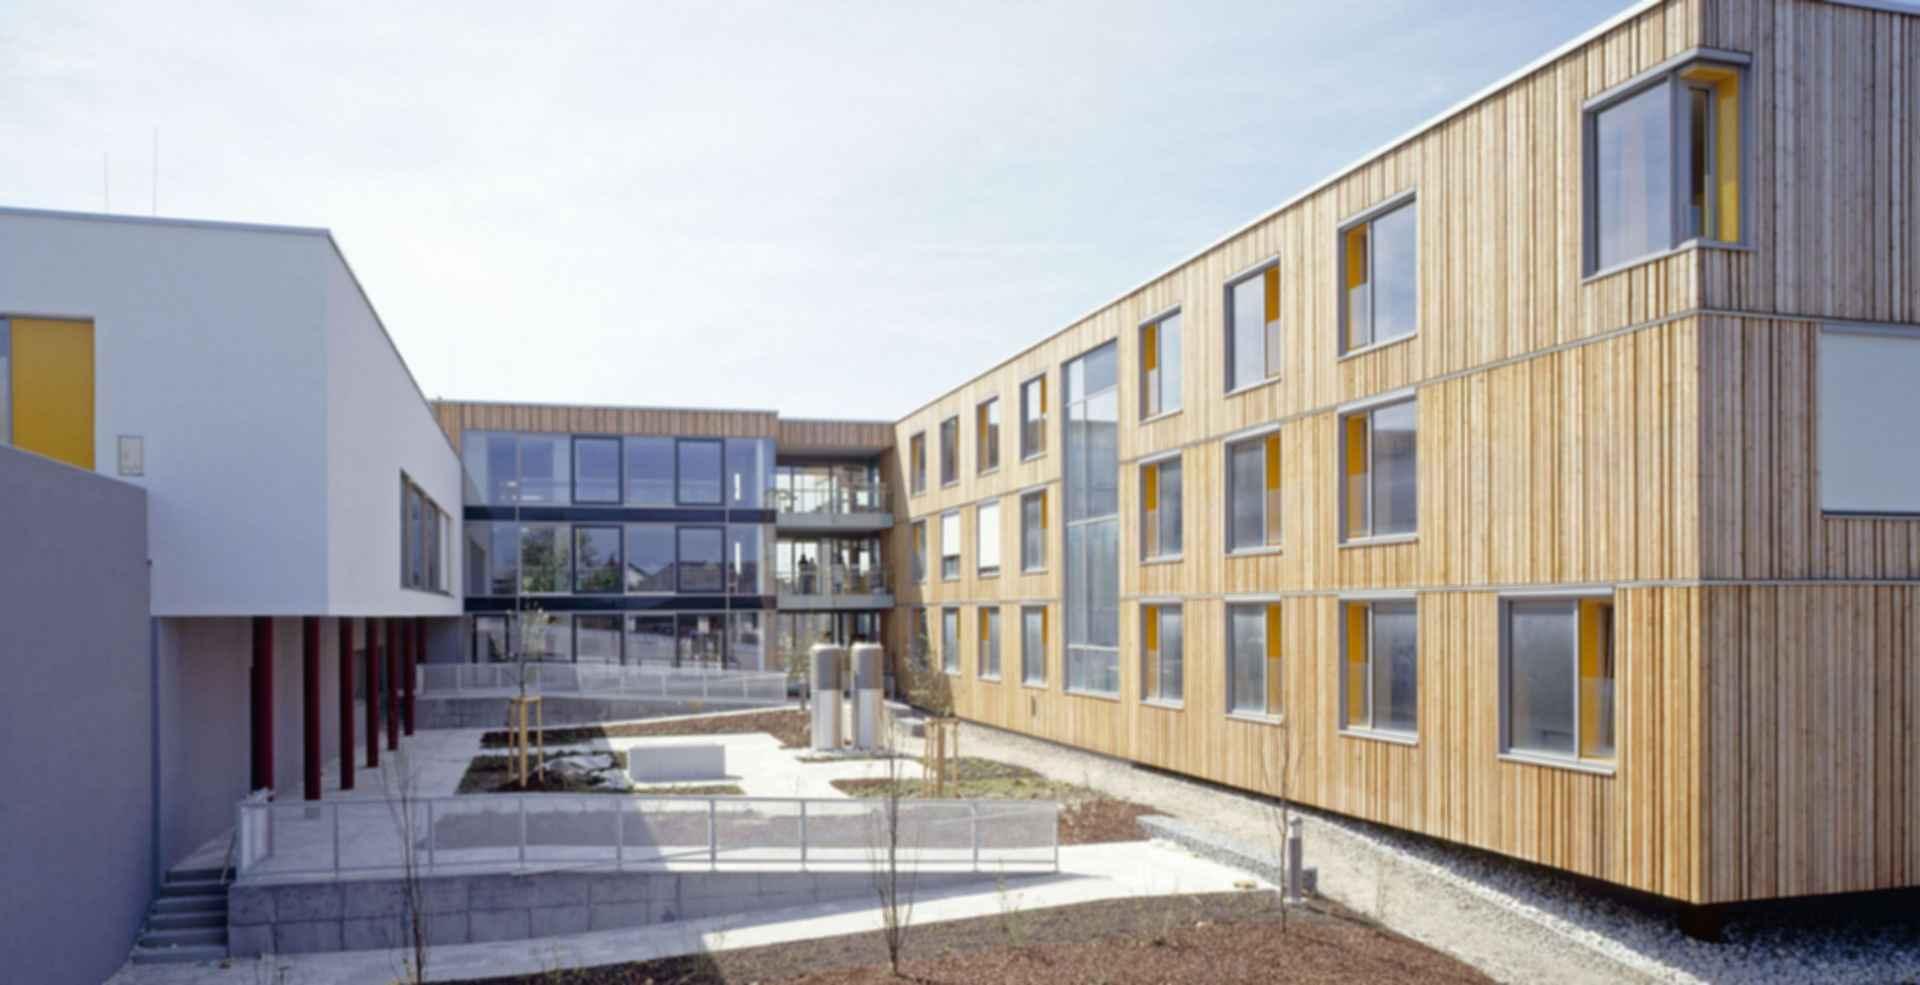 Nursing Home in Esternberg - exterior